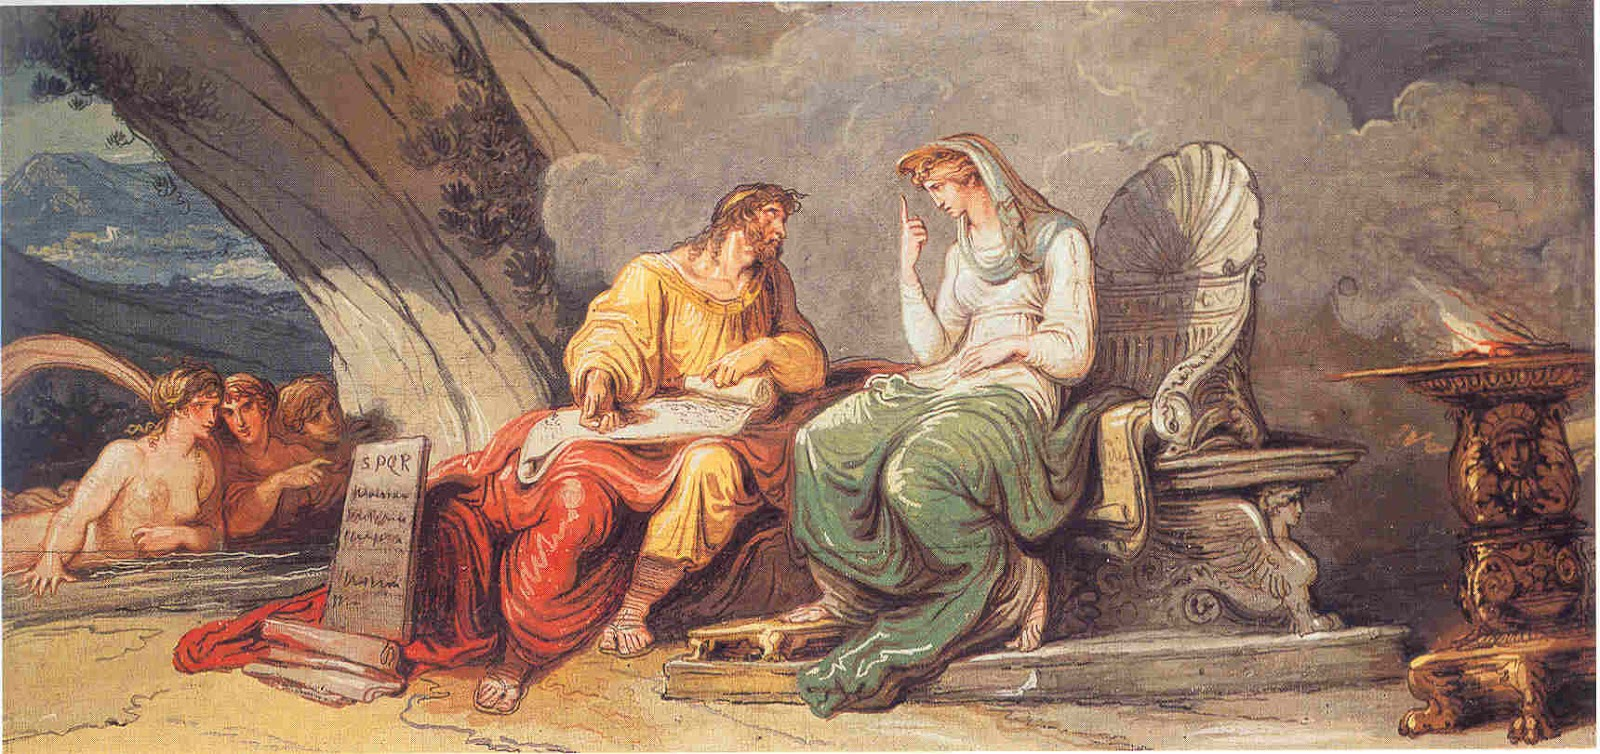 Egeria Gives the Laws of Rome to Numa Pompilius , Anna Ottani Cavina, Spanish Embassy to the Holy See, Rome, 1806.